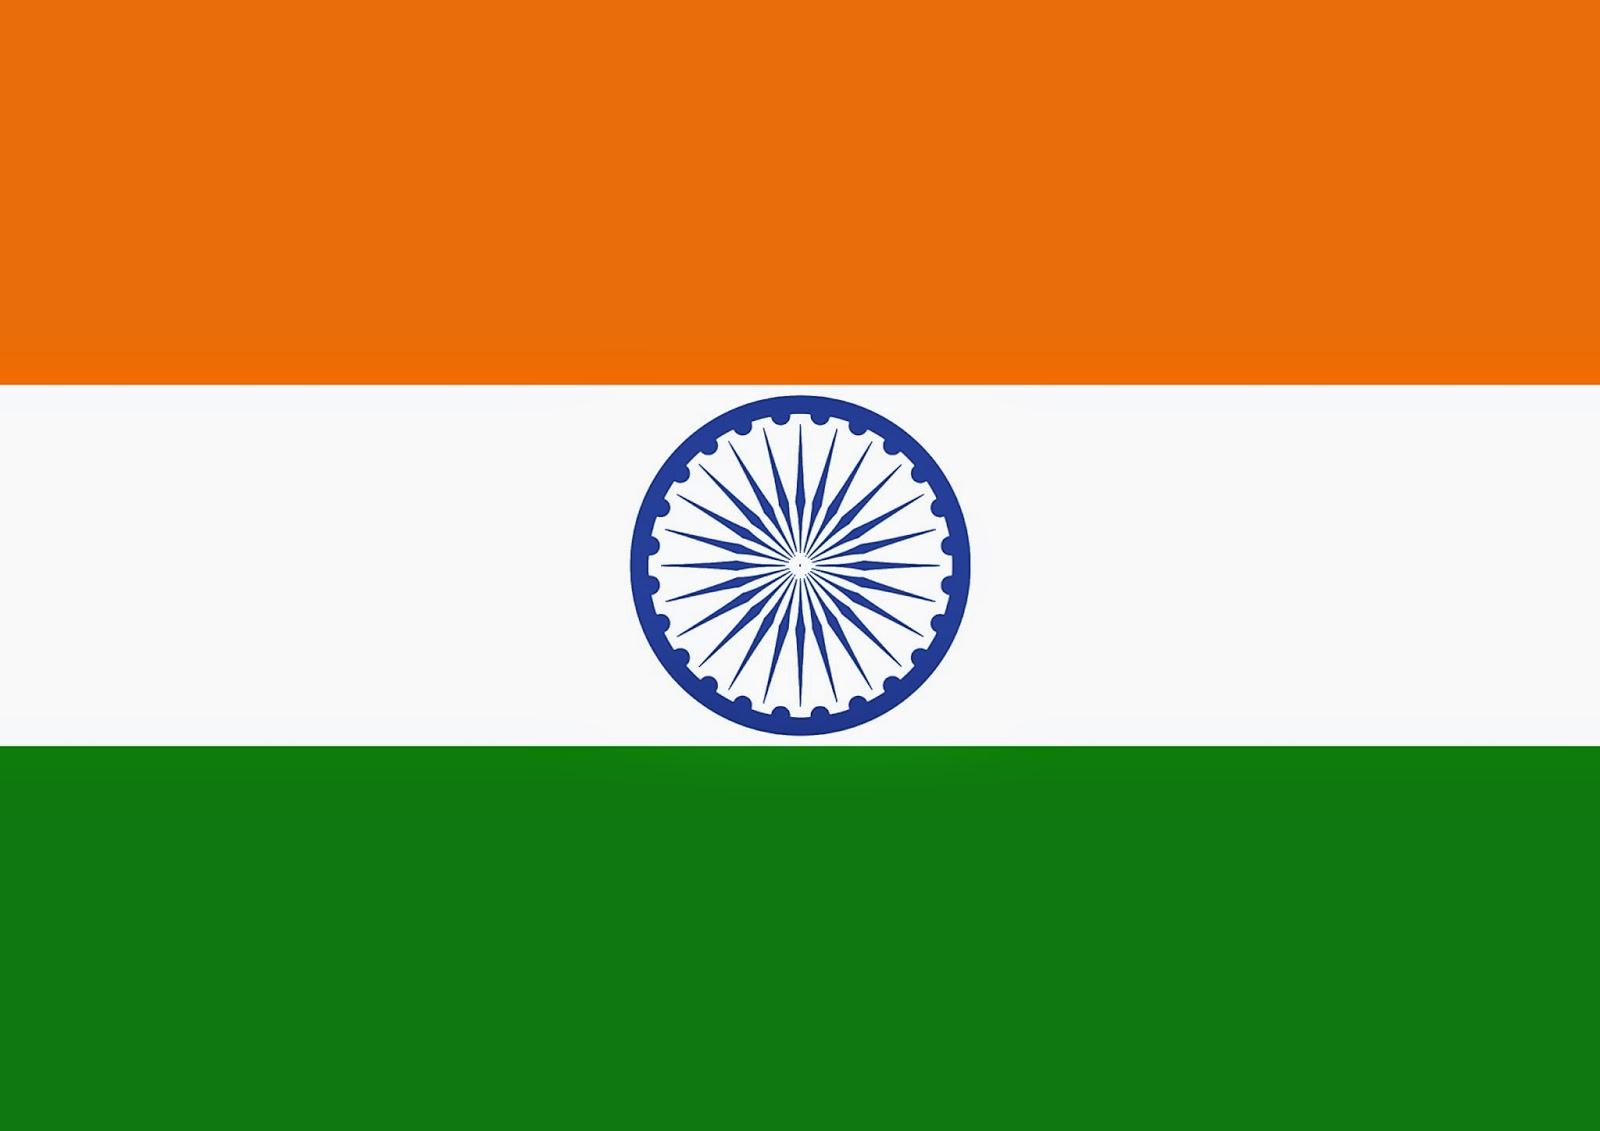 Historical Symbols Of India Lydias Culture